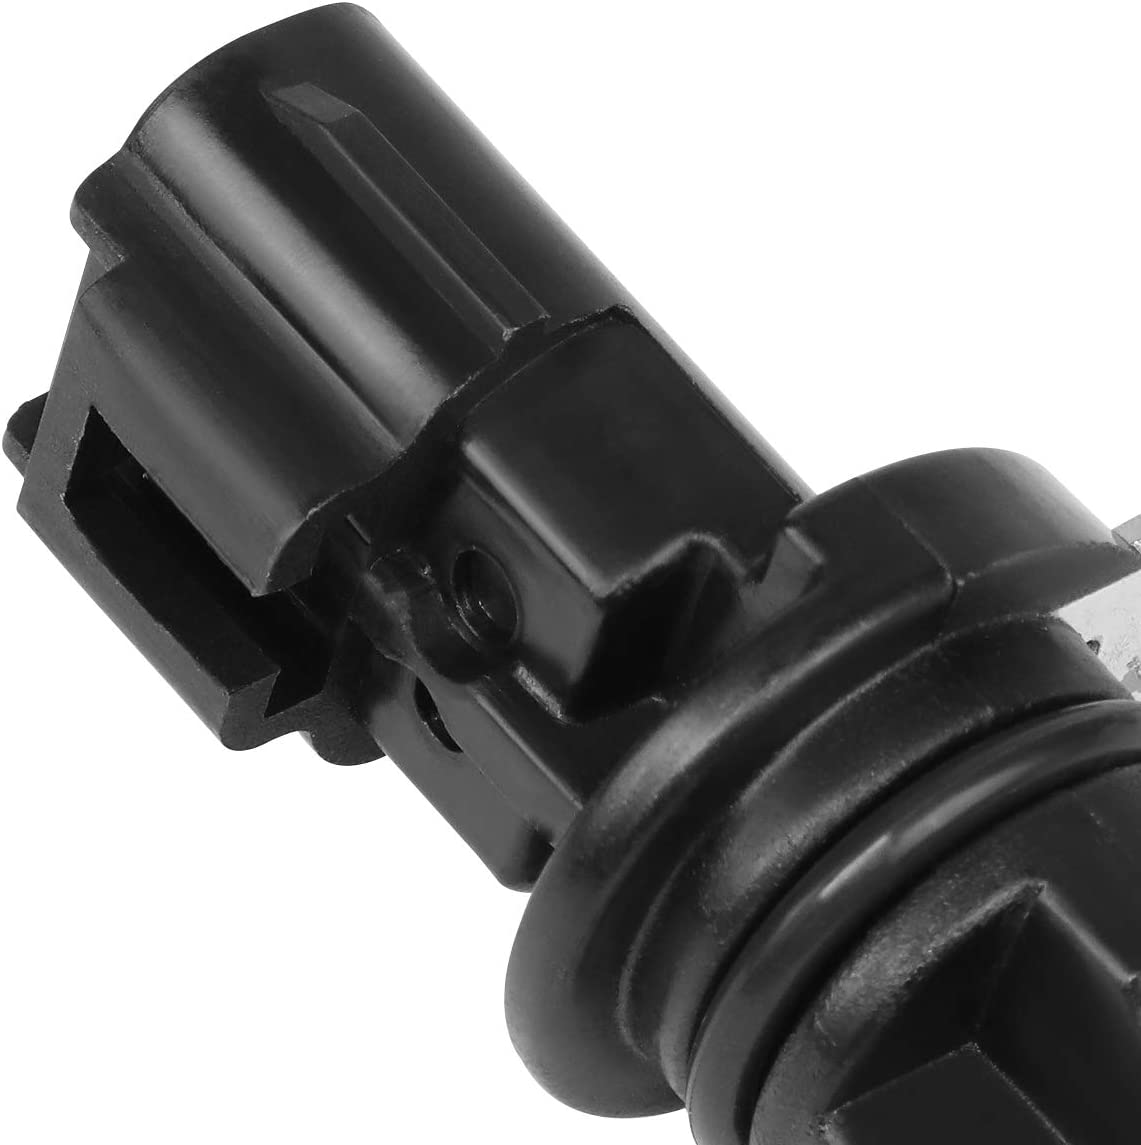 Engine Cam Camshaft Position Sensor Replacement for Charger Dakota Durango Ram Aspen 99-07